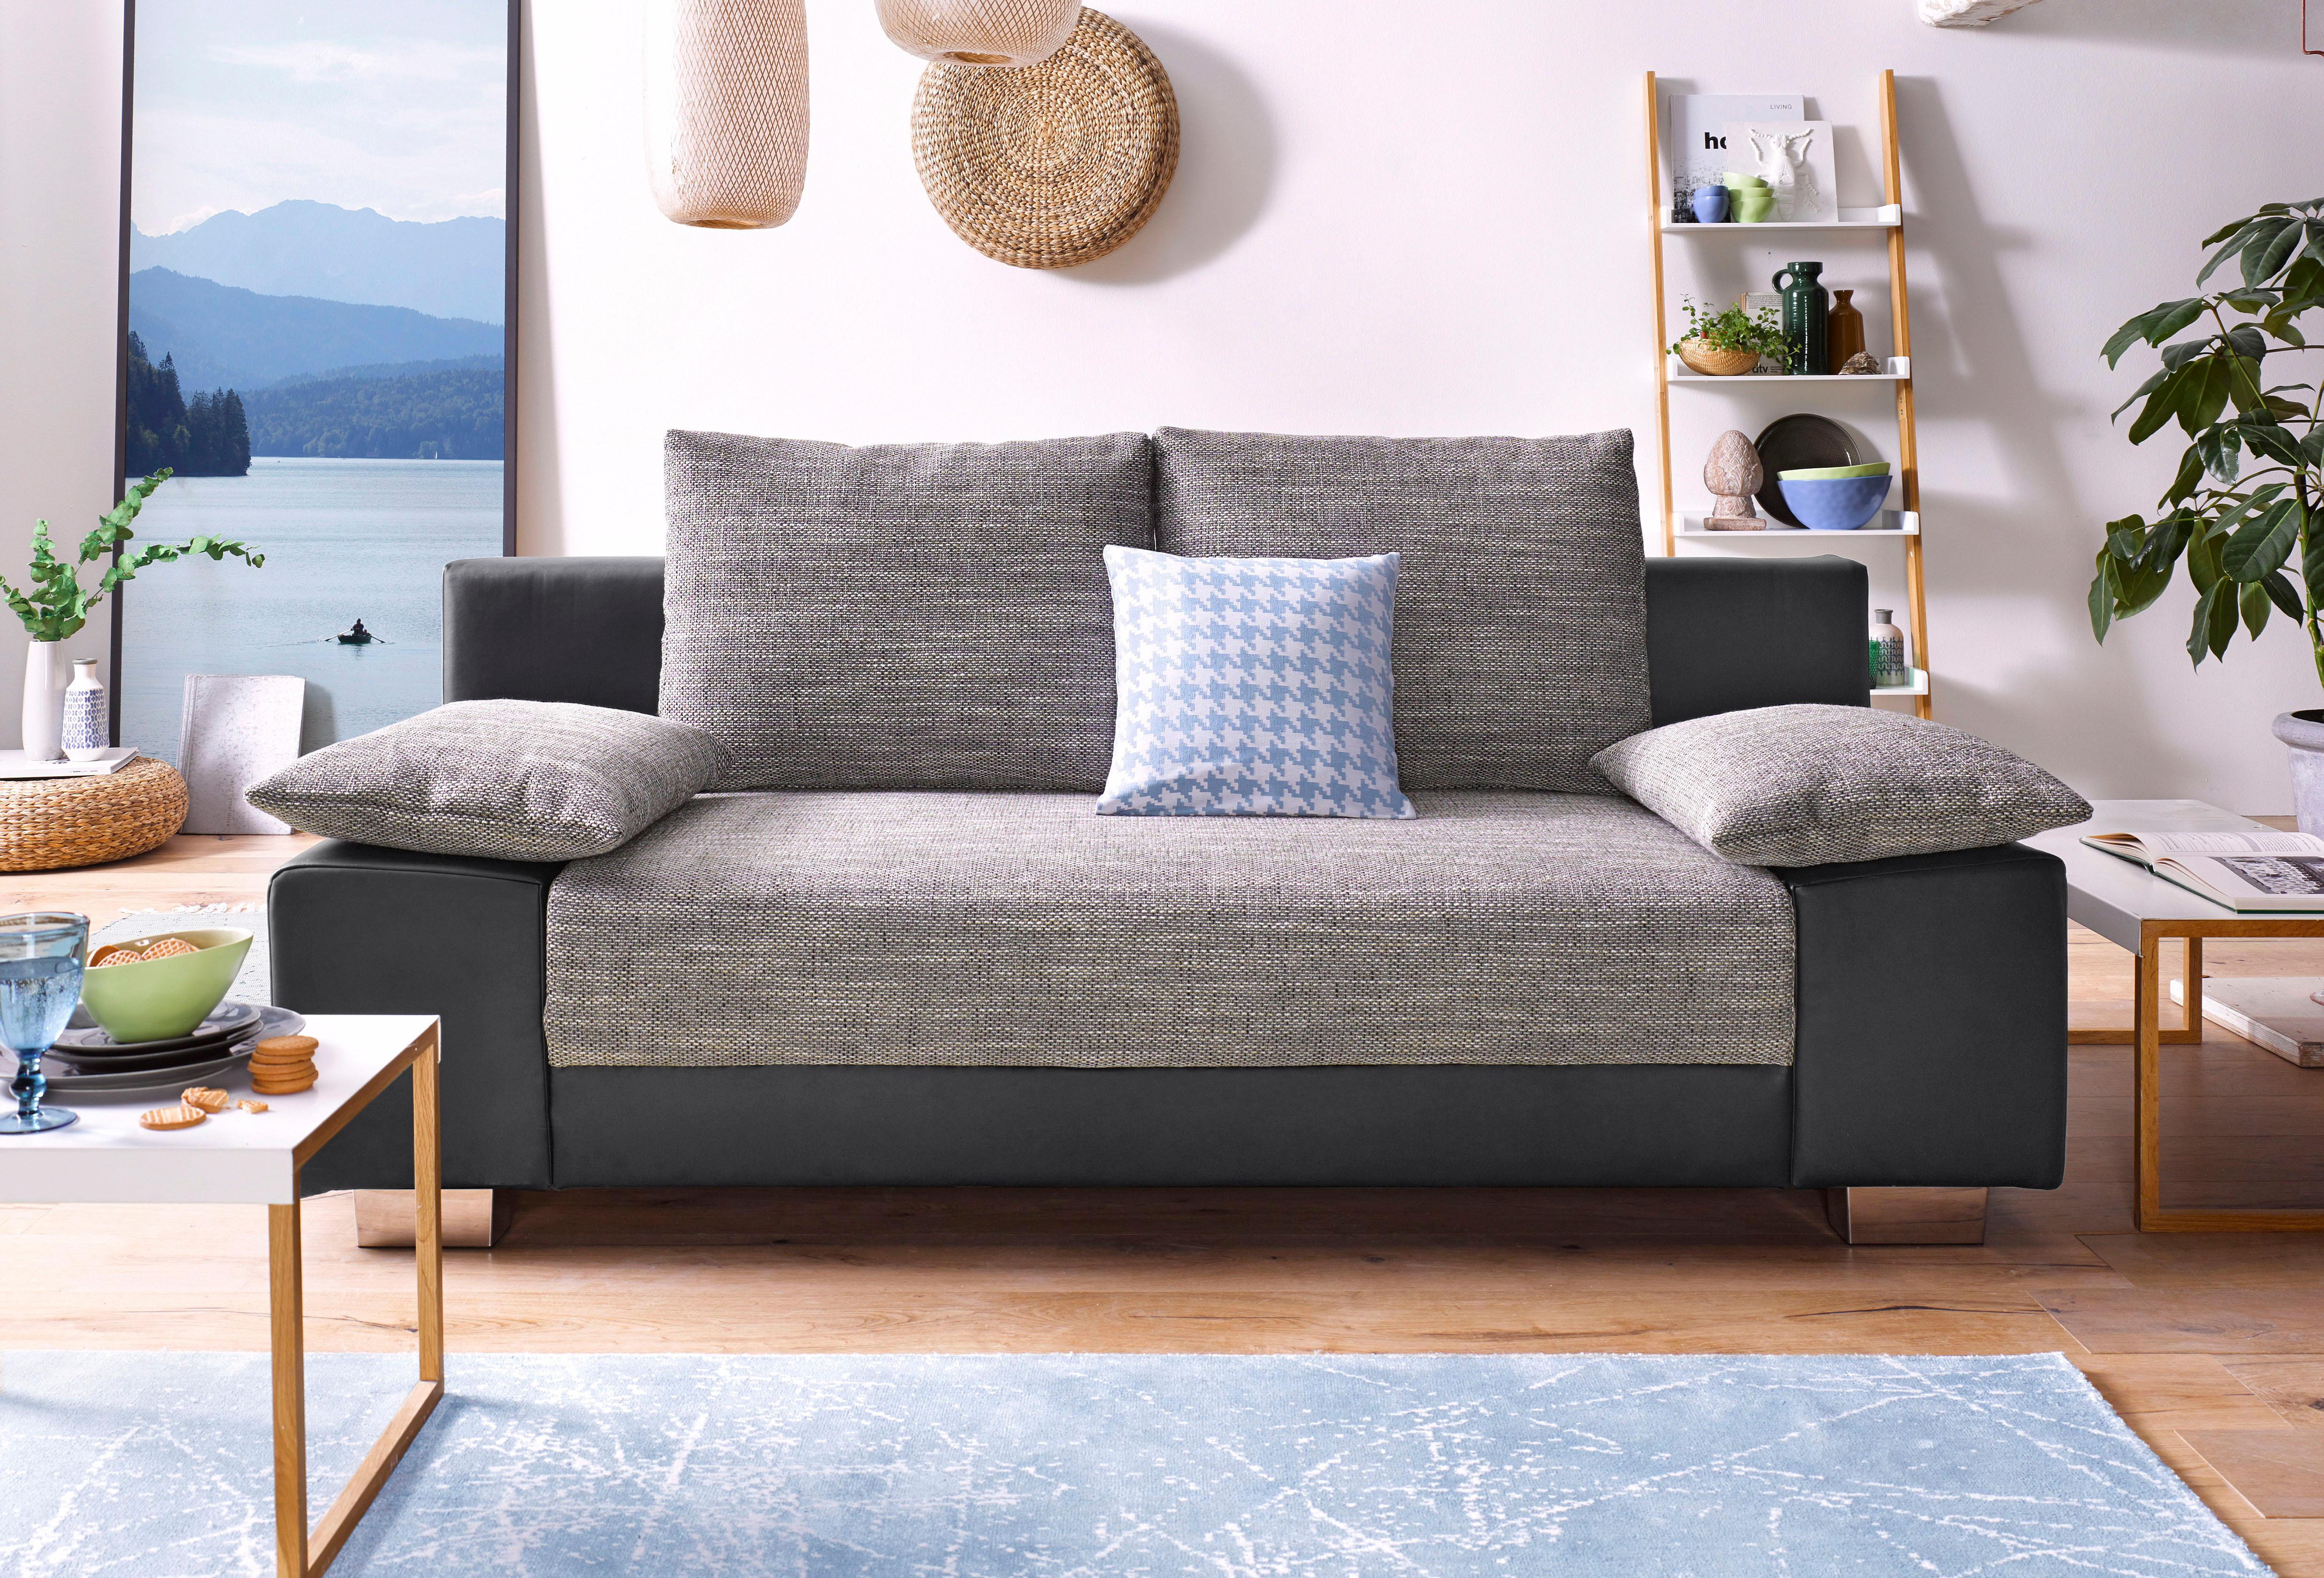 collection ab schlafsofa moebel suchmaschine. Black Bedroom Furniture Sets. Home Design Ideas